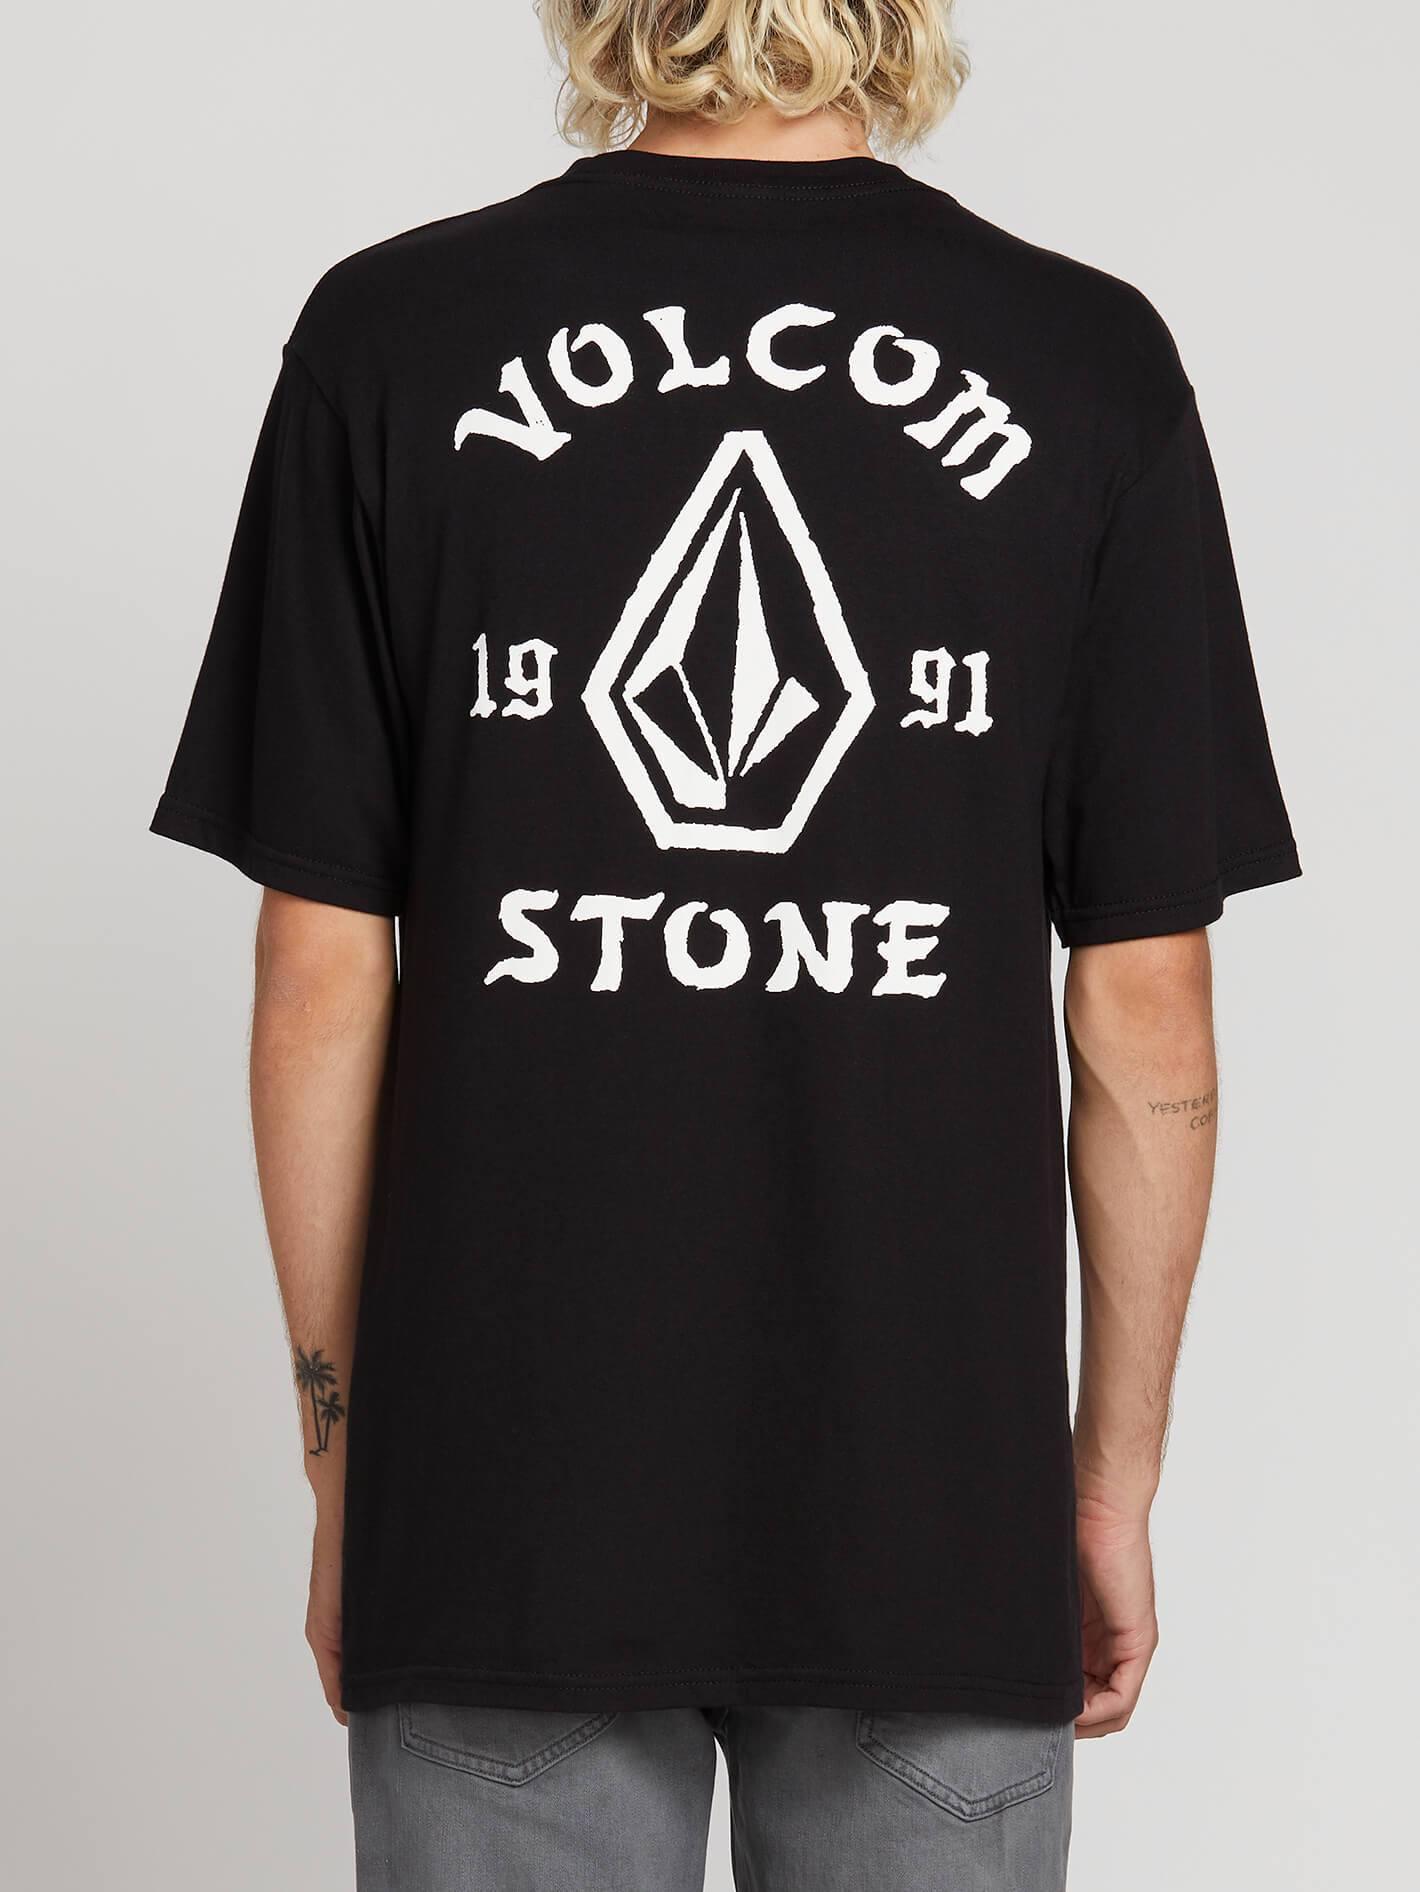 Volcom Big Boys Stone Waves Short Sleeve Rashguard